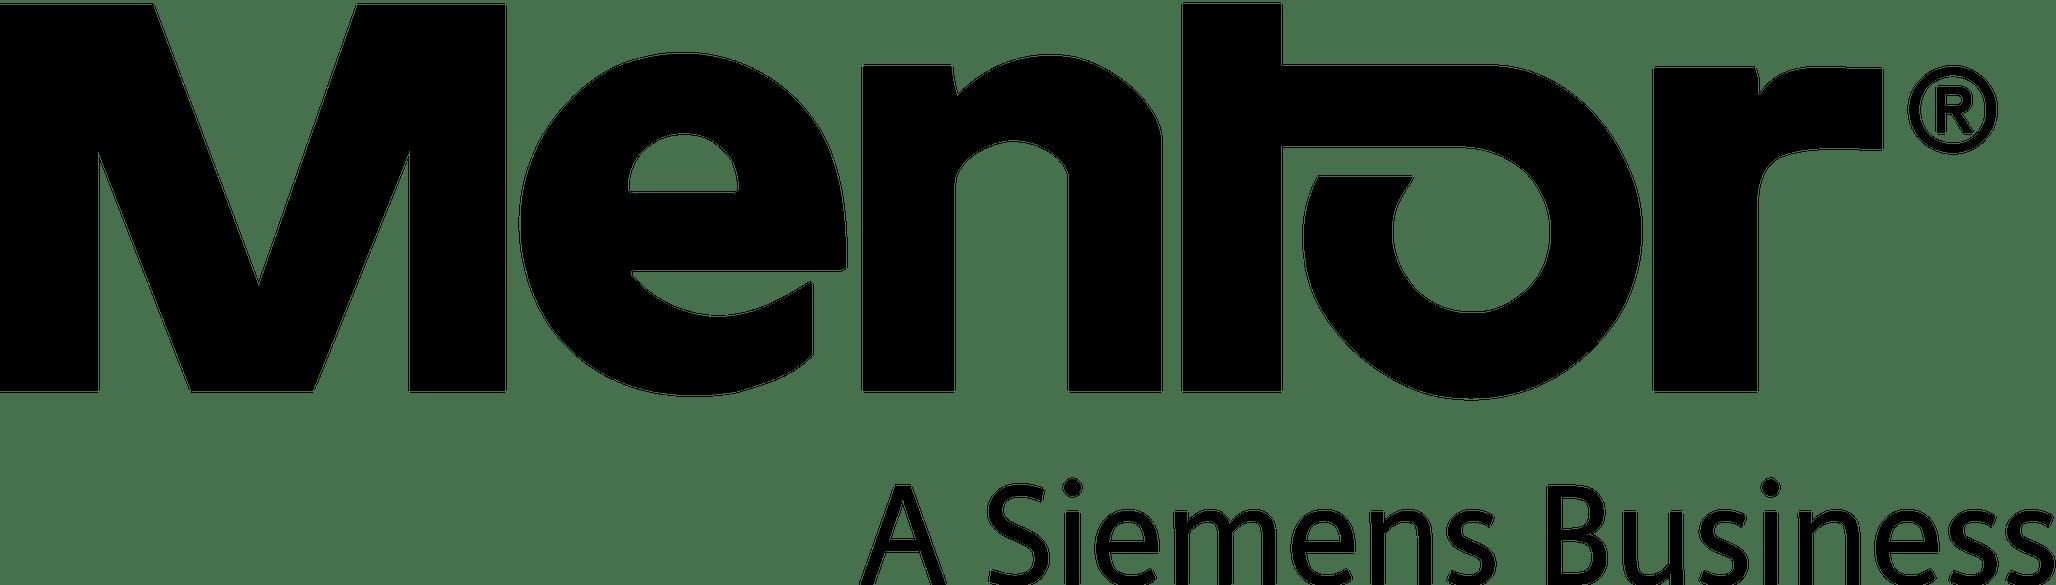 Mentor a Siemens Company Logo